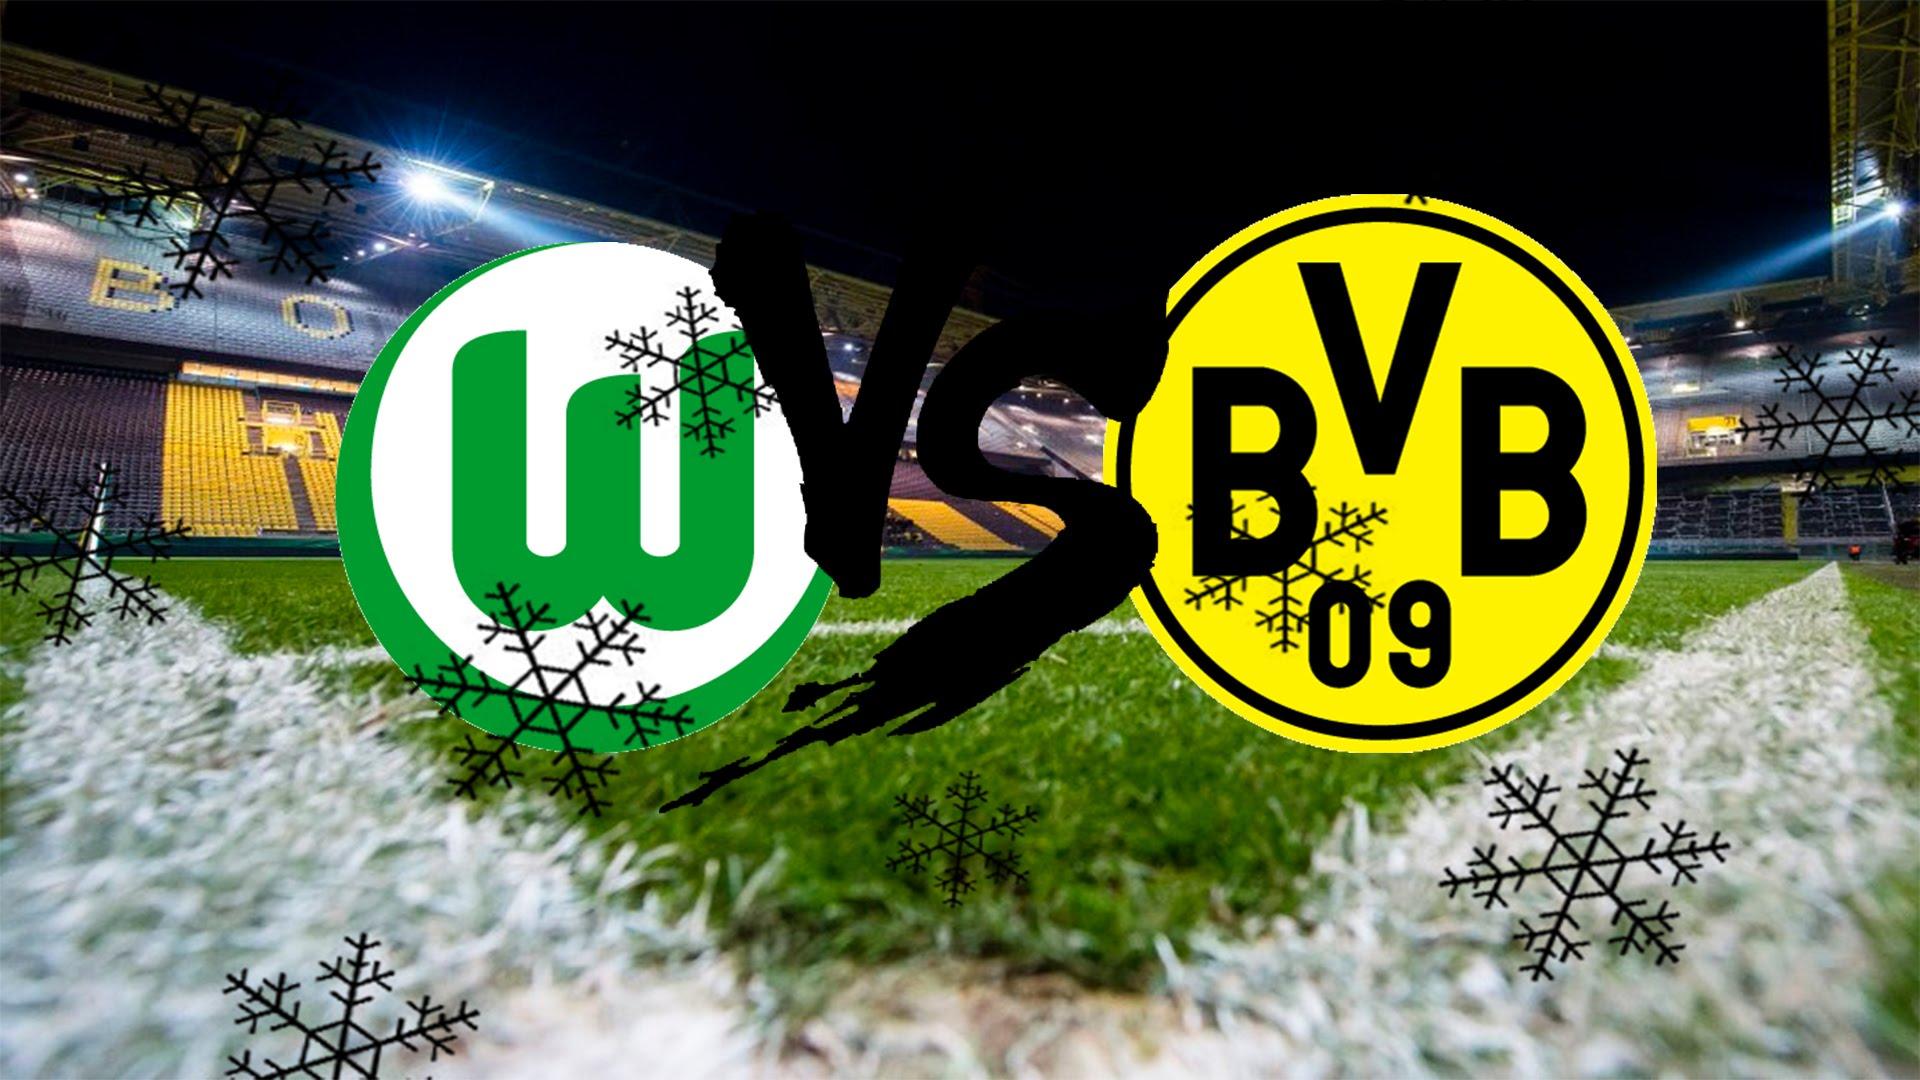 Prediksi Pertandingan Wolfsburg Vs Borussia Dortmund 19 Agustus 2017